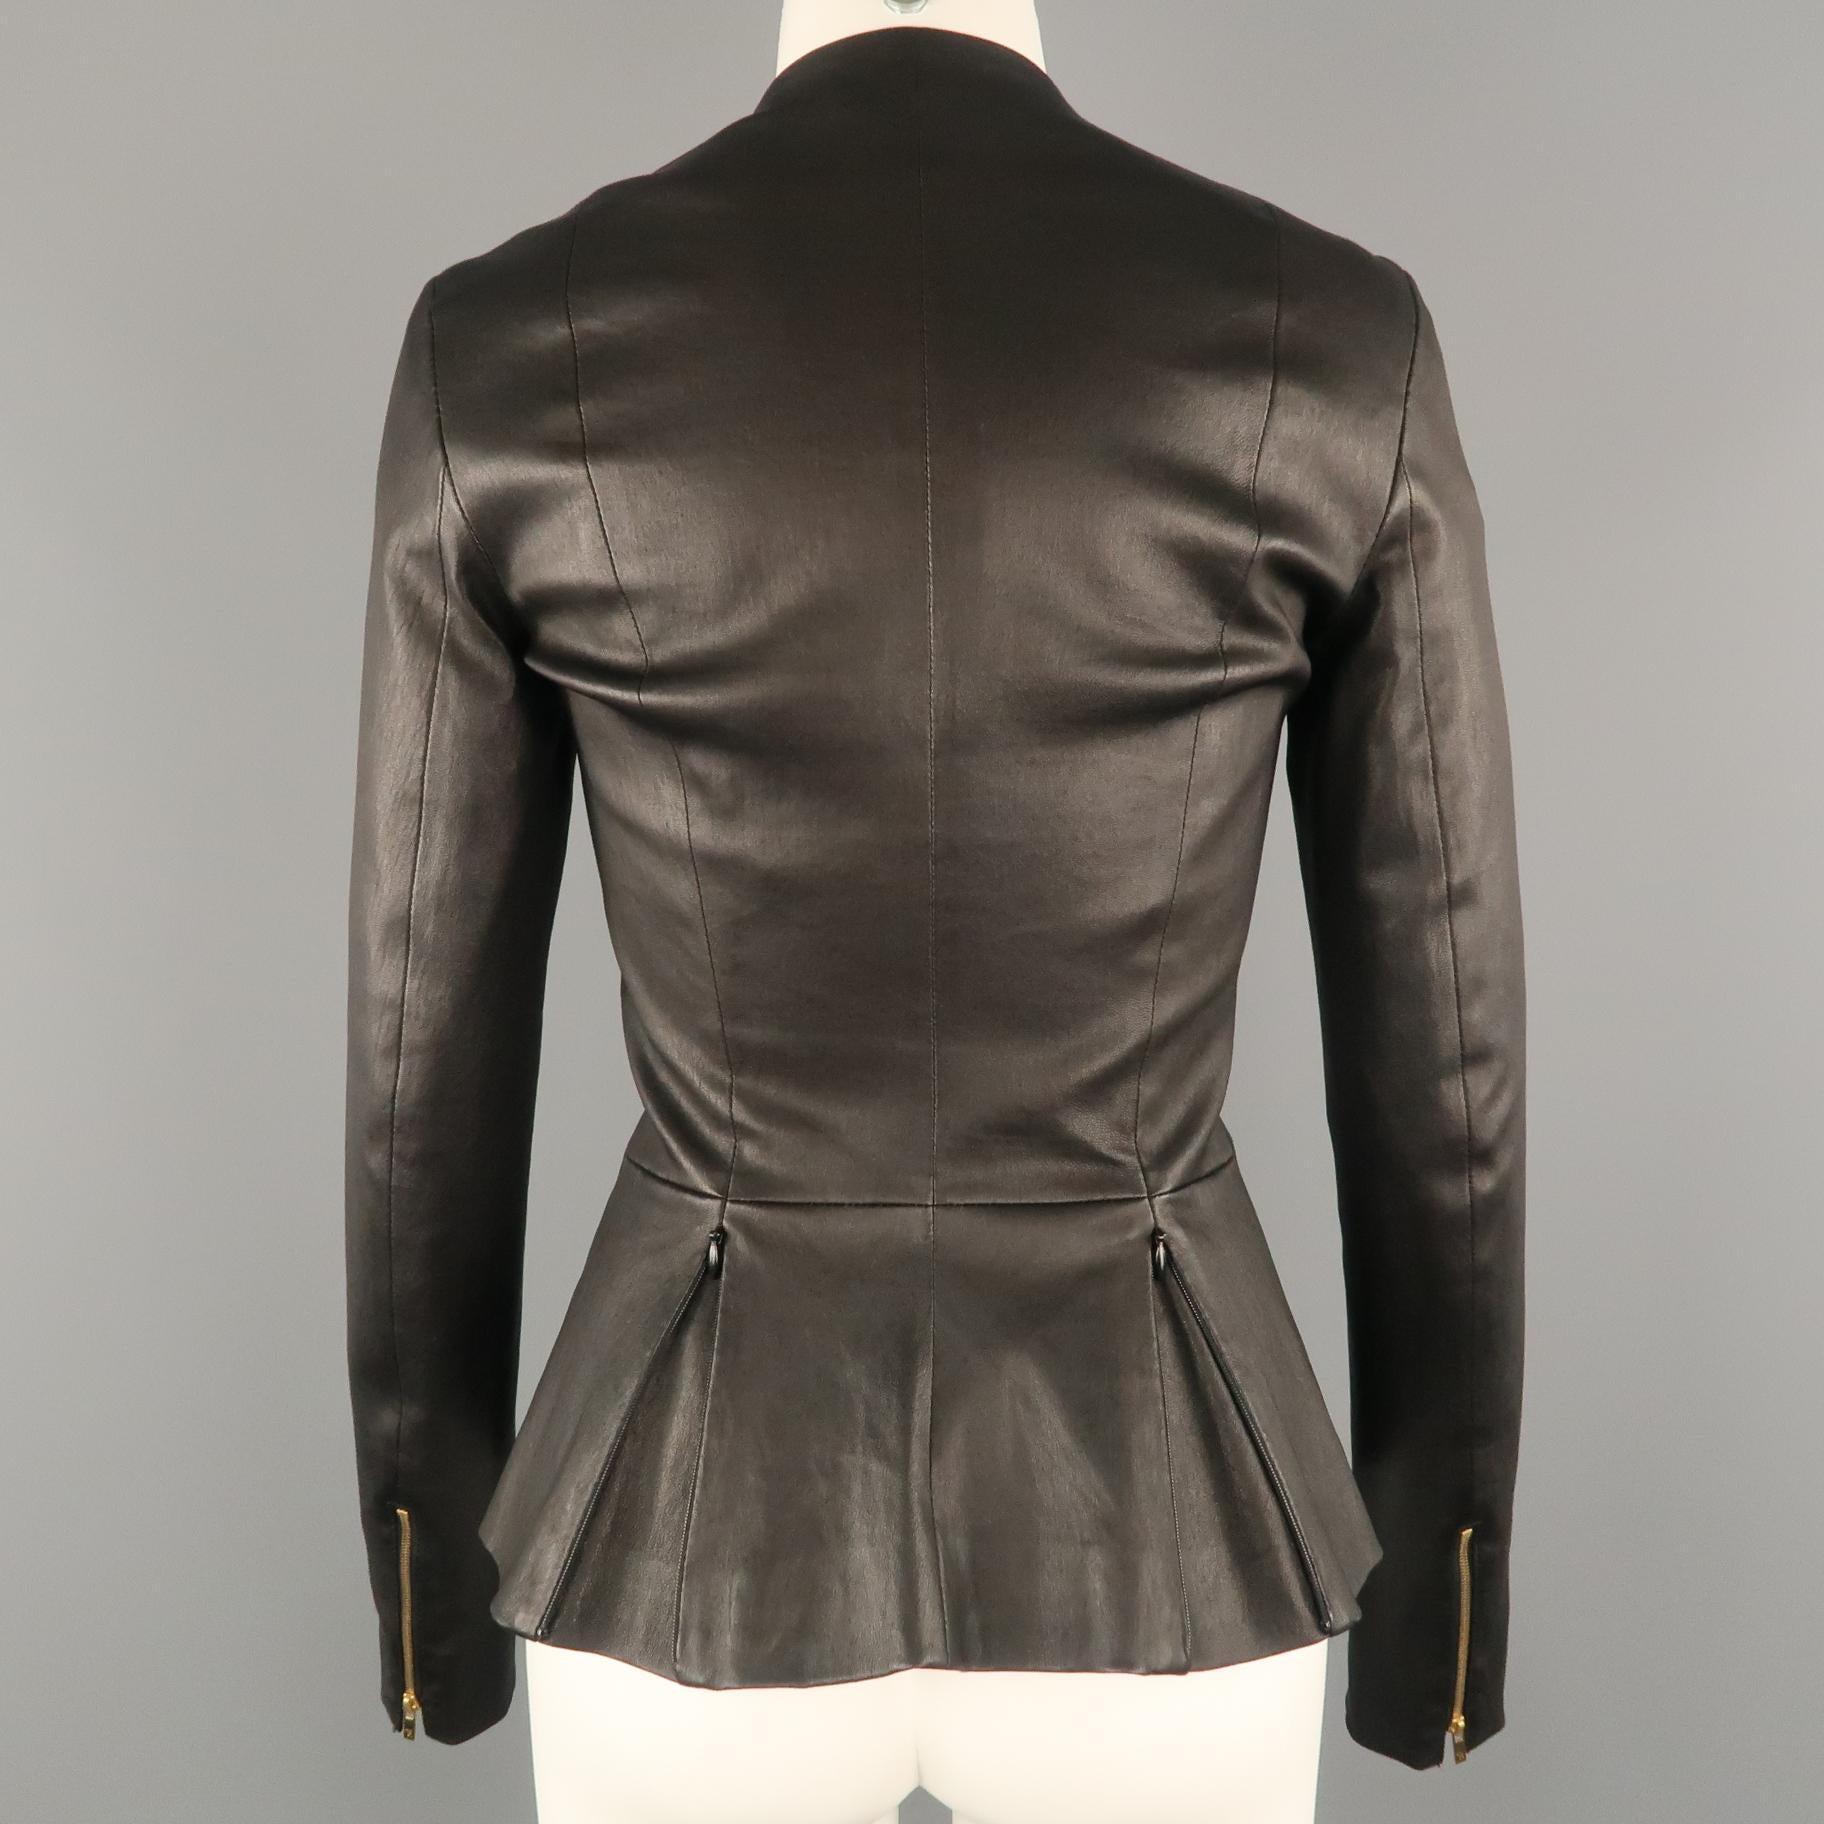 d4b29ebe8 THE ROW Size 4 Black Leather Zip Peplum ANASTA Jacket